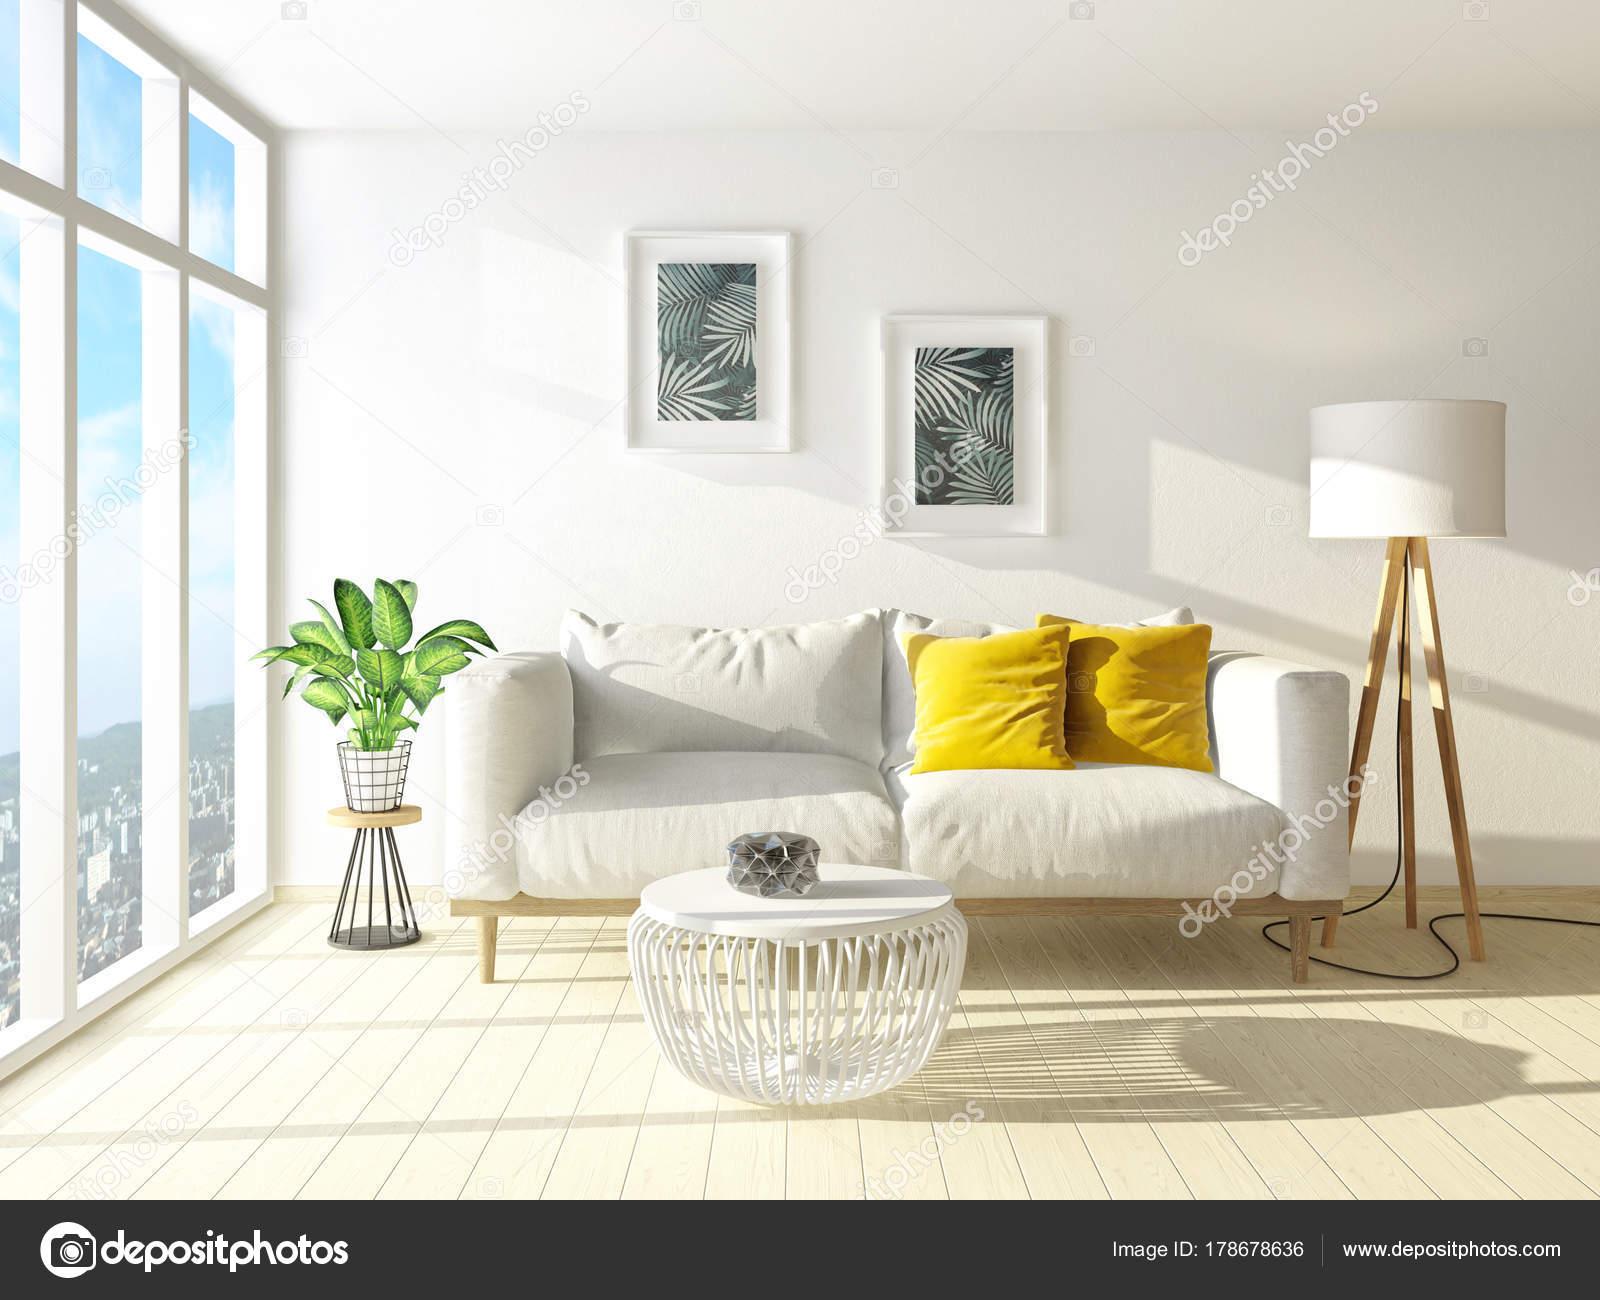 Design Woonkamer Lampen : Moderne woonkamer met sofa lamp scandinavisch interieur design